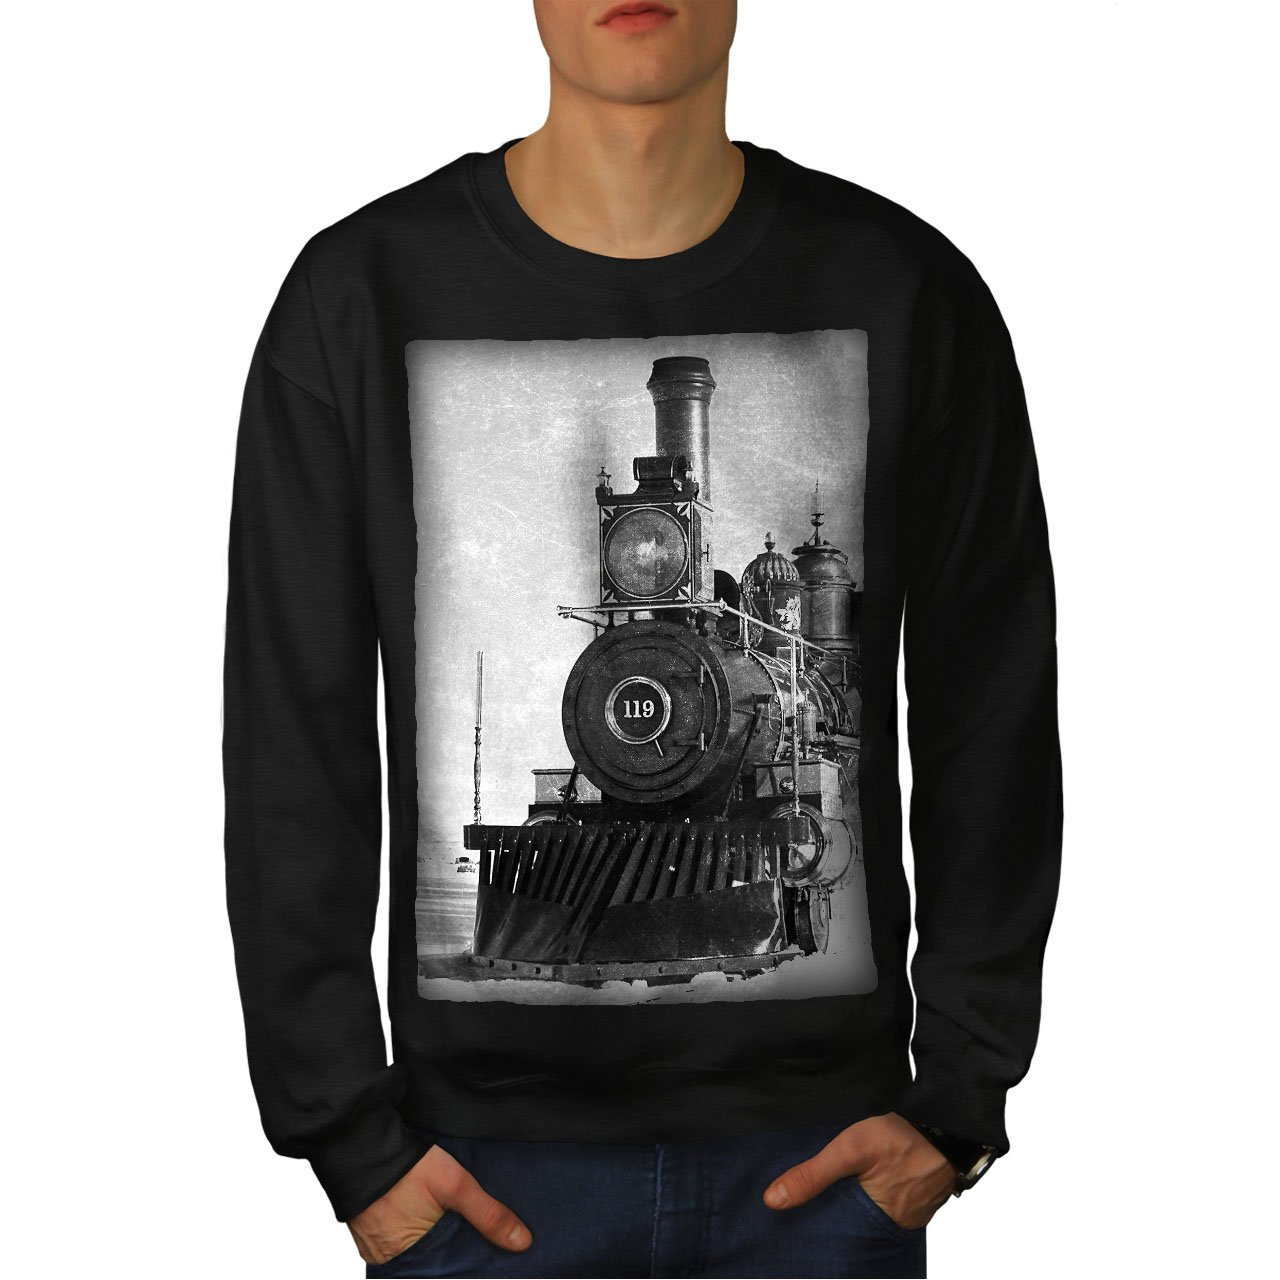 wellcoda Retro Train Picture Mens Sweatshirt Vintage Casual Jumper